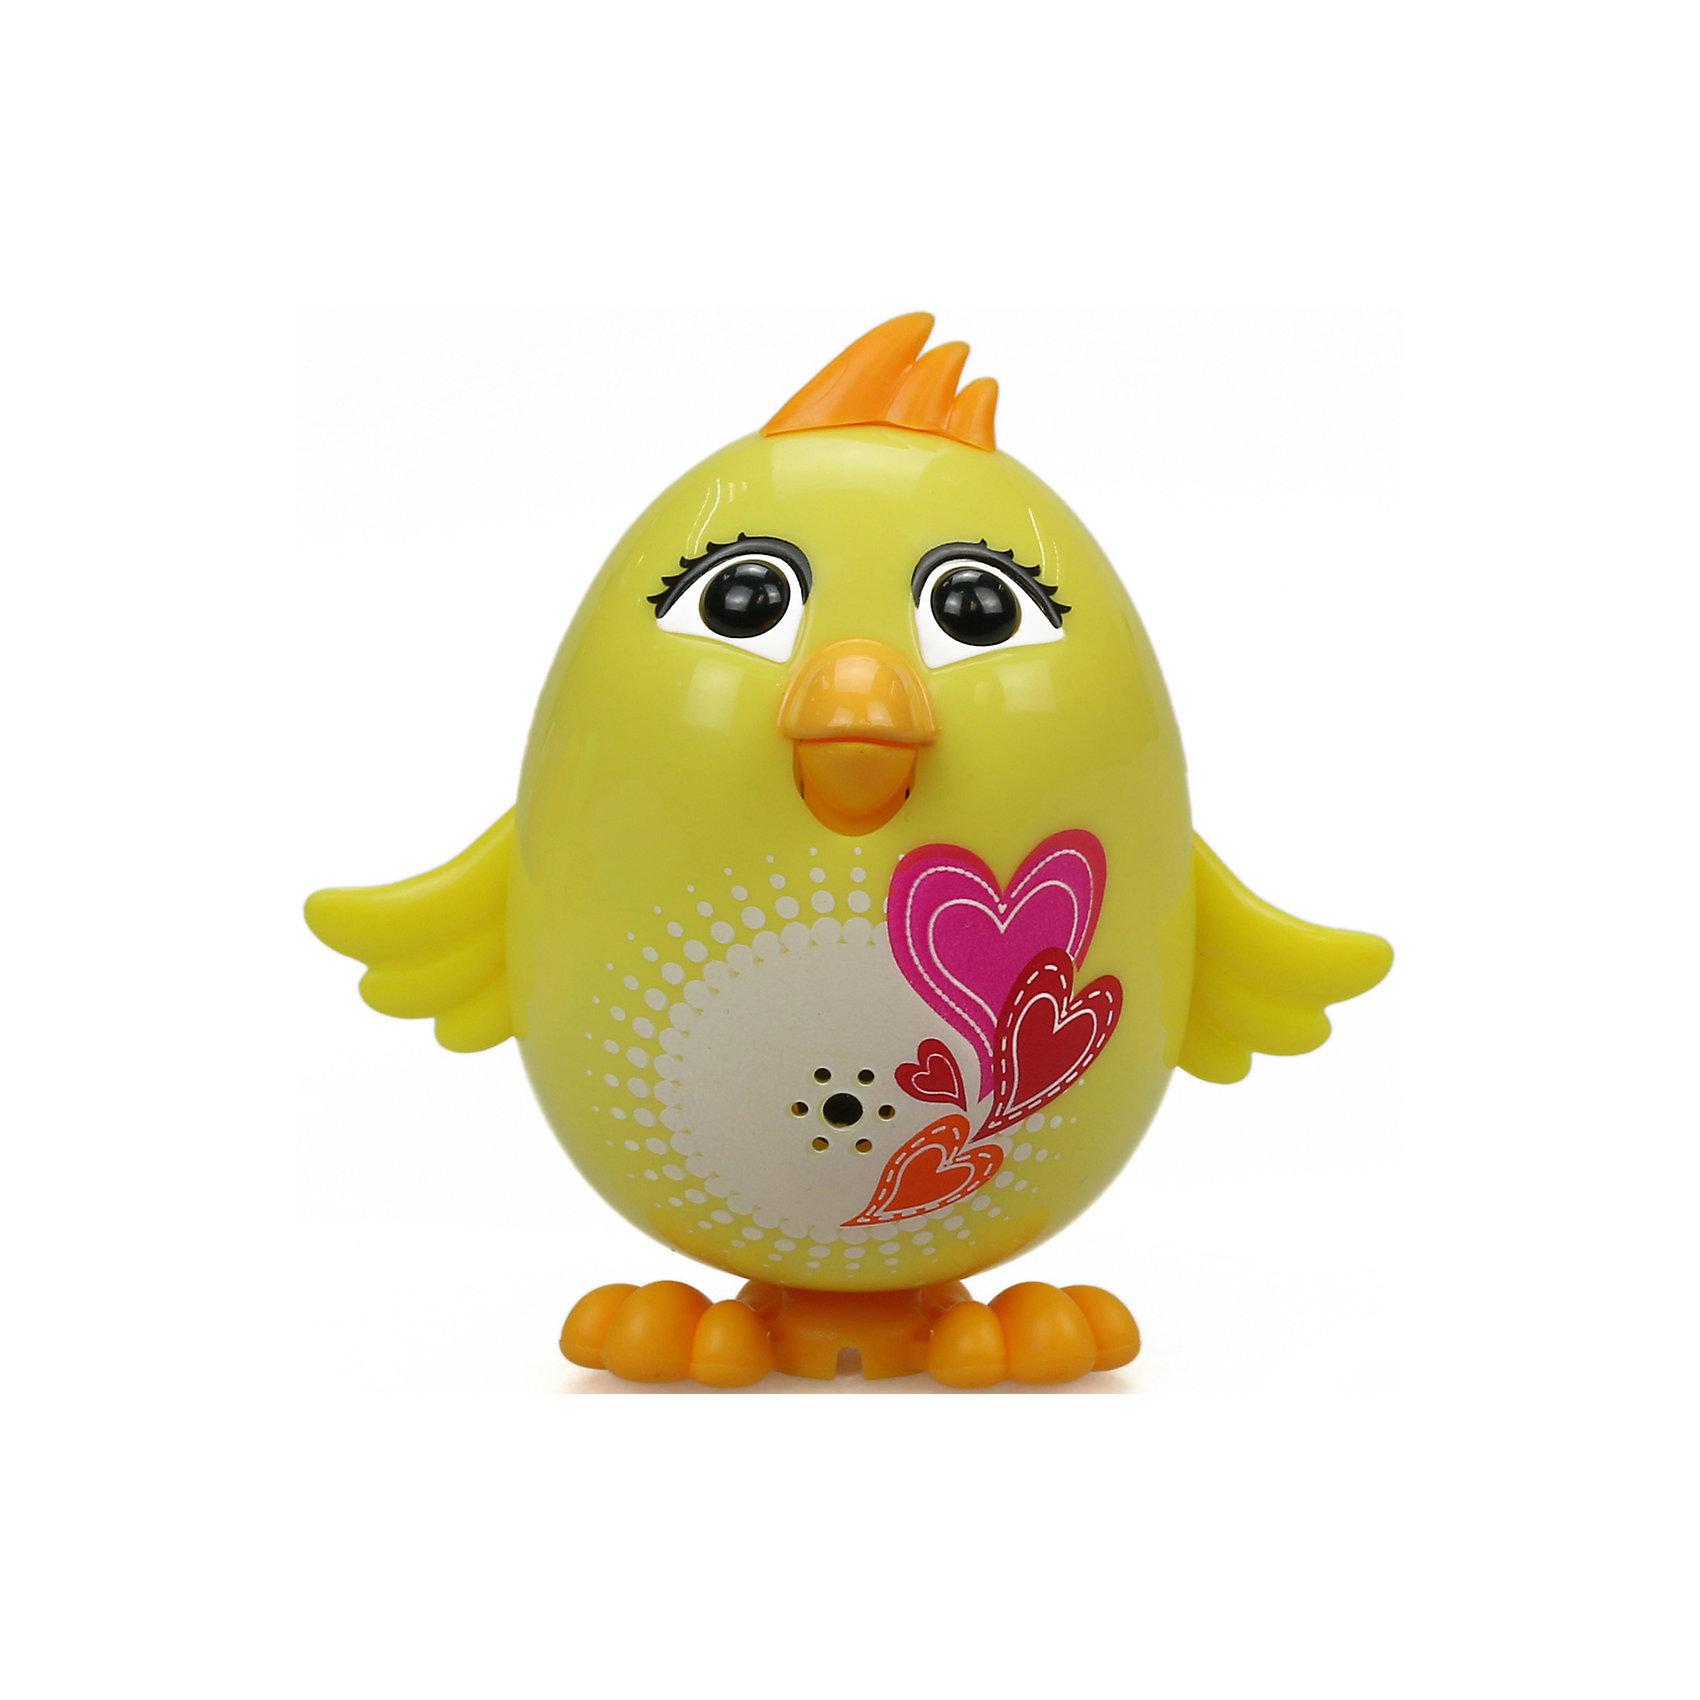 Цыпленок с кольцом Mila, желтый, DigiBirds